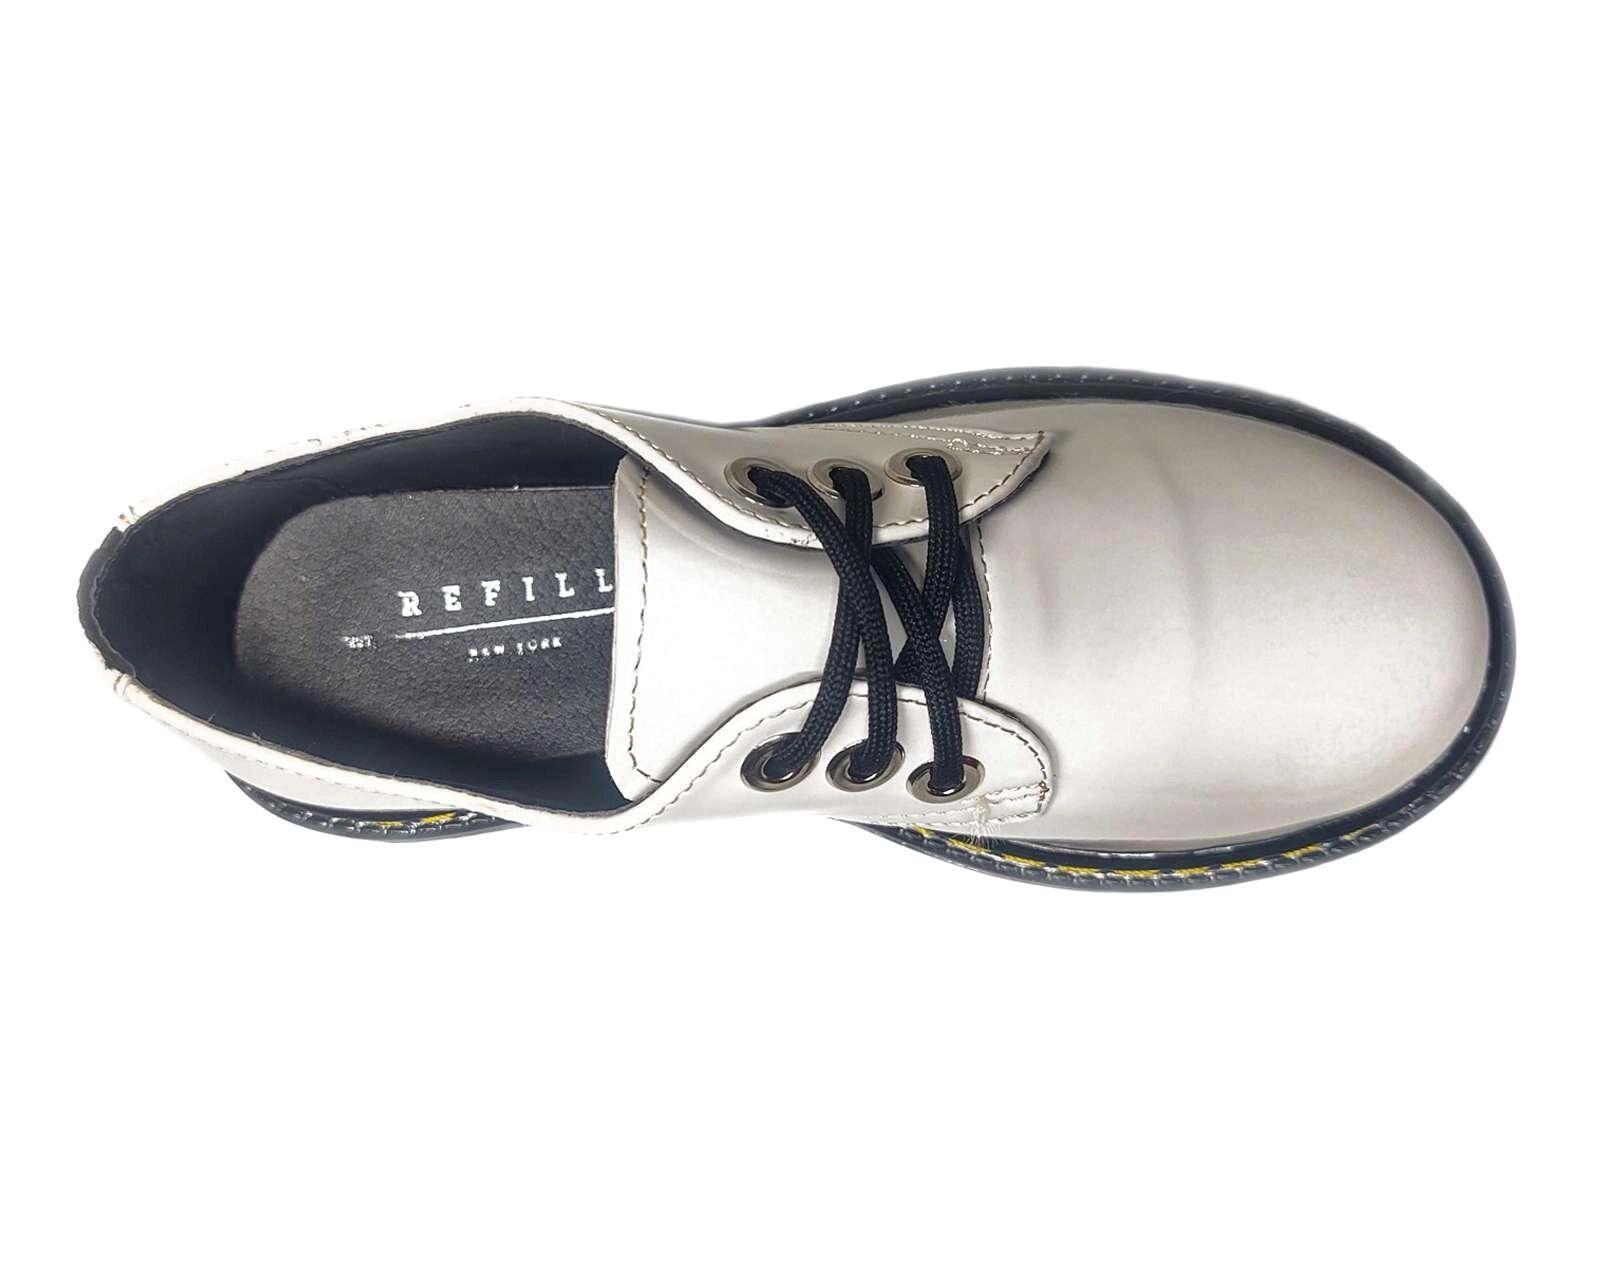 Foto 4|Zapatos Casuales Refill para Mujer